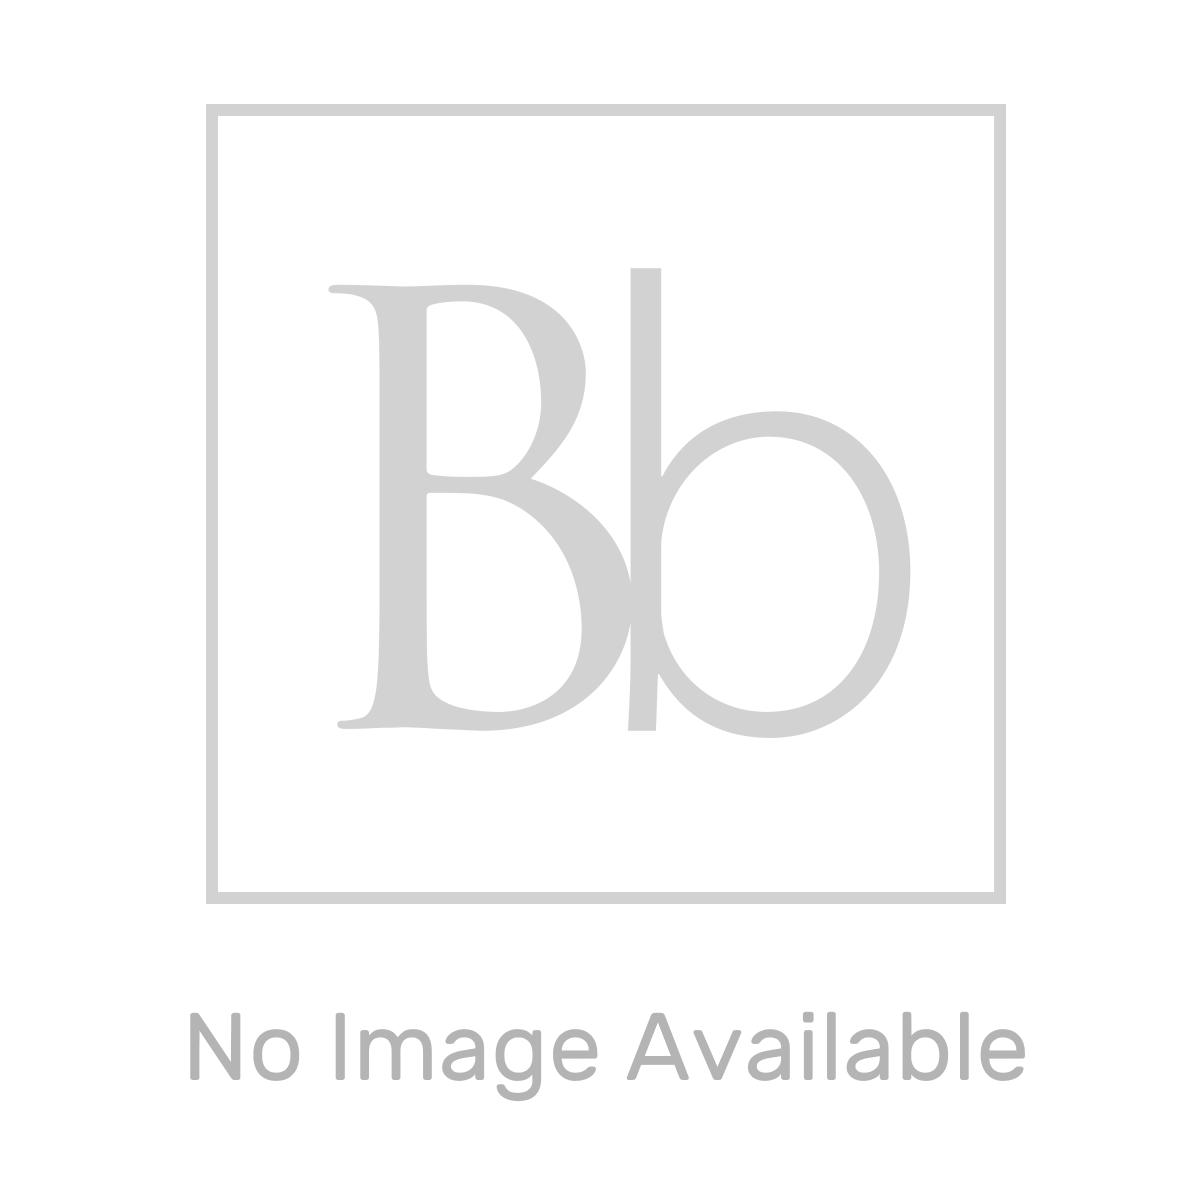 RAK Compact Shower Suite with Pacific Hinged Door Shower Enclosure